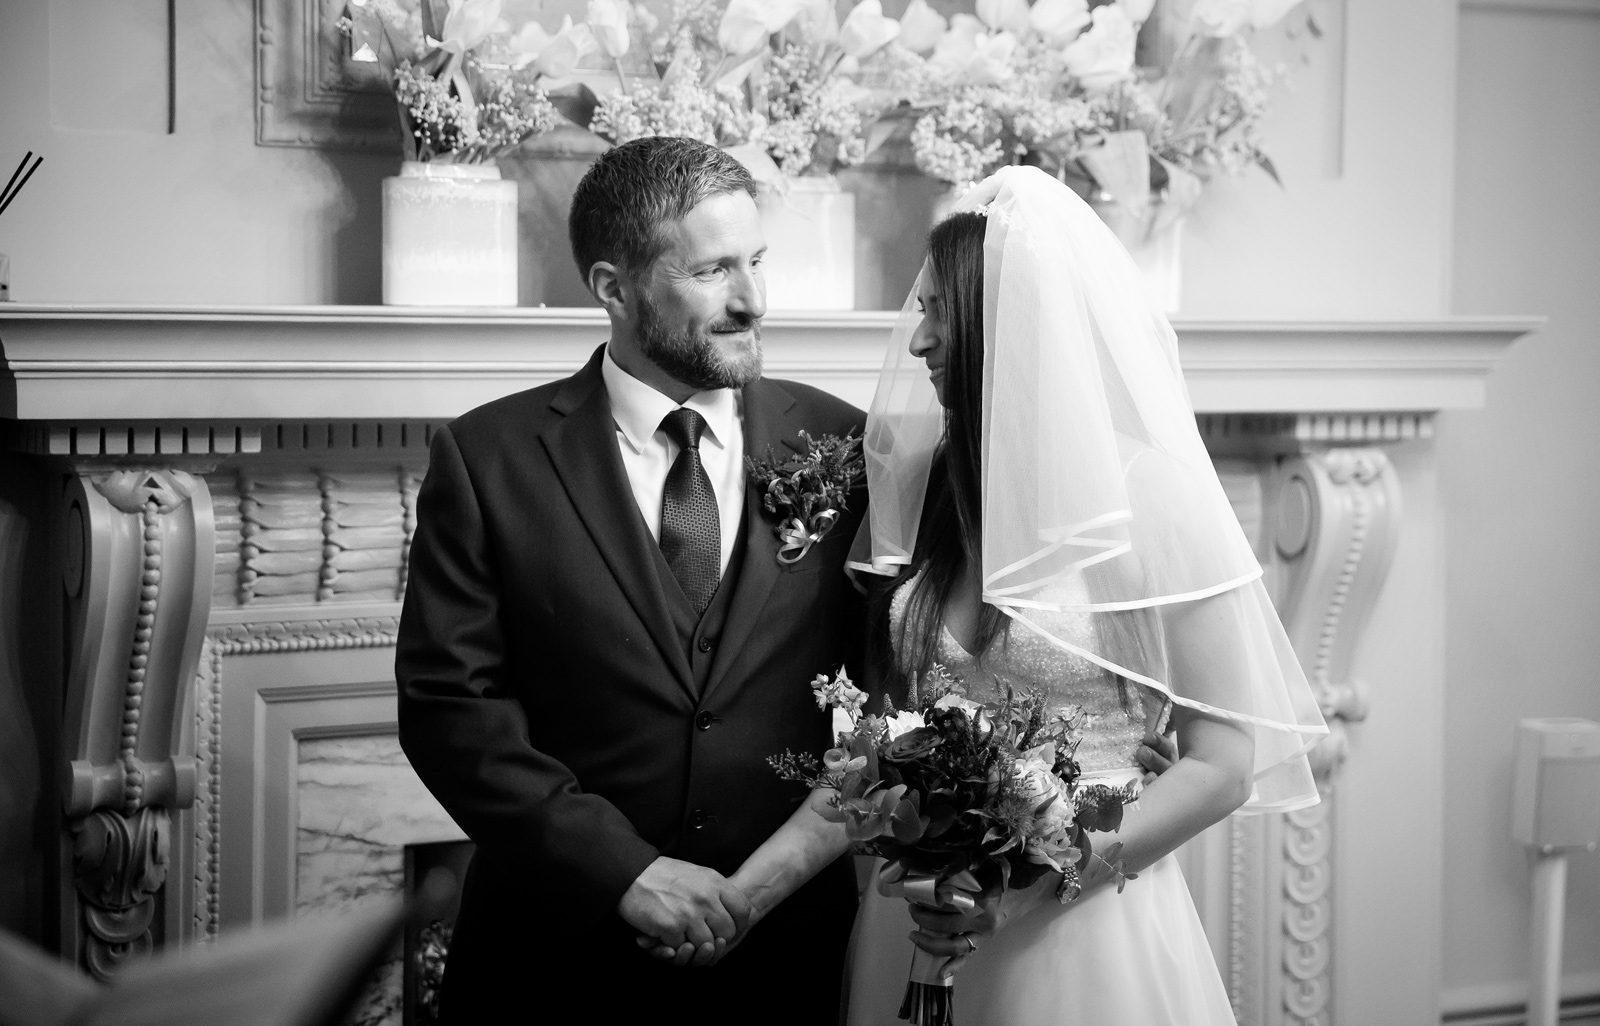 Weddings at Old Marylebone Town Hall 2021 style London Wedding Photographers